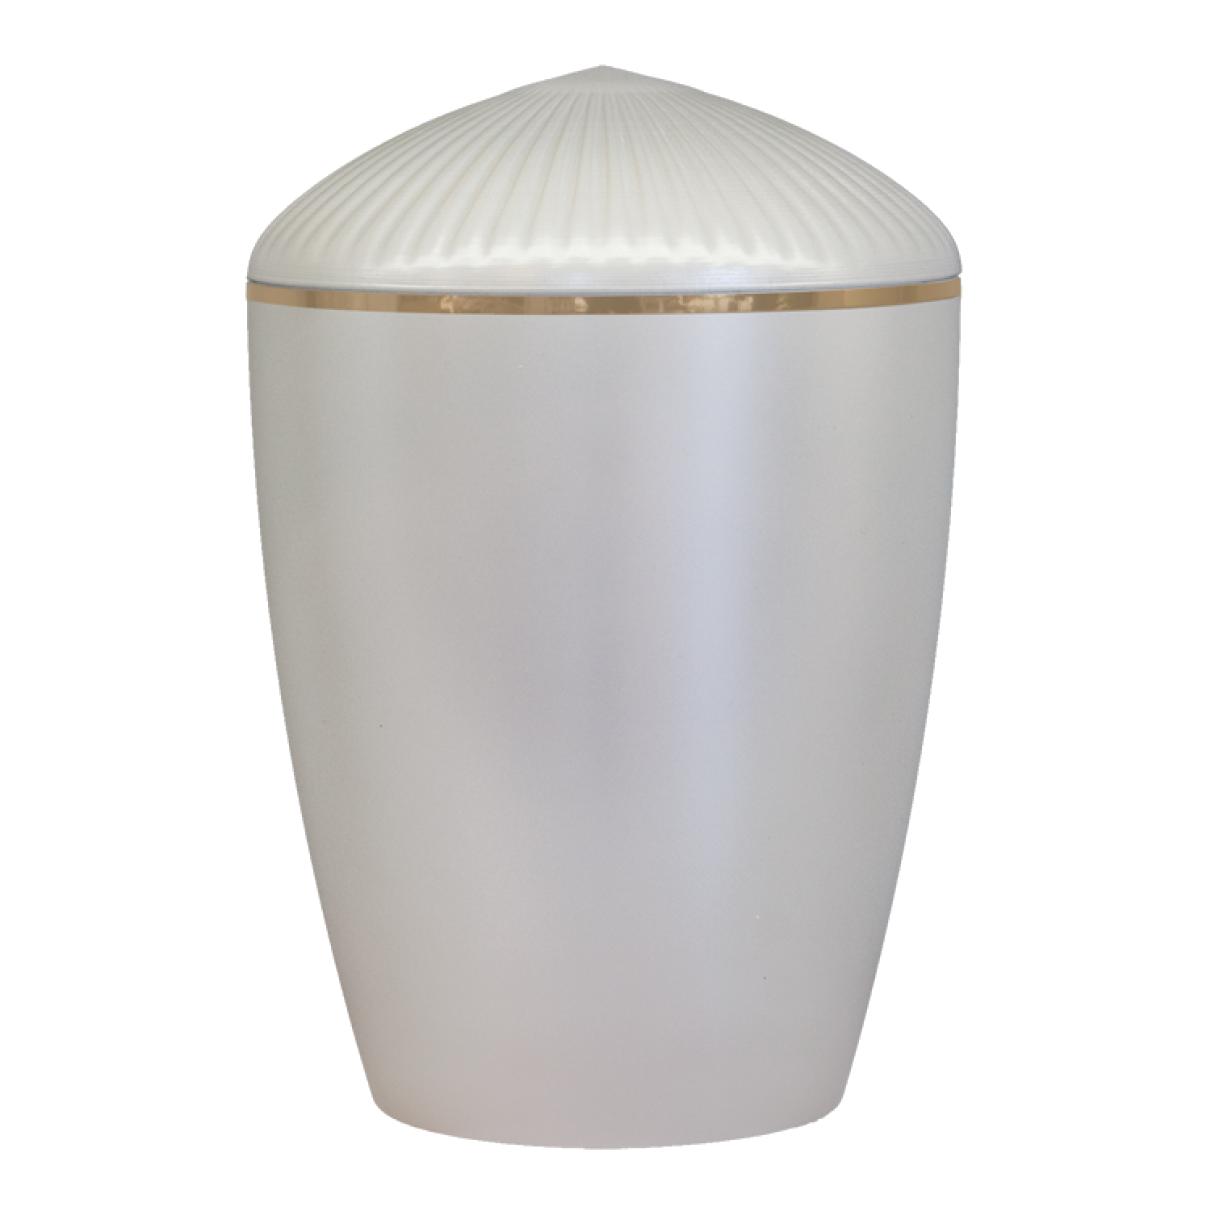 Ferndown Gold Band Cremation Urn – Pearl